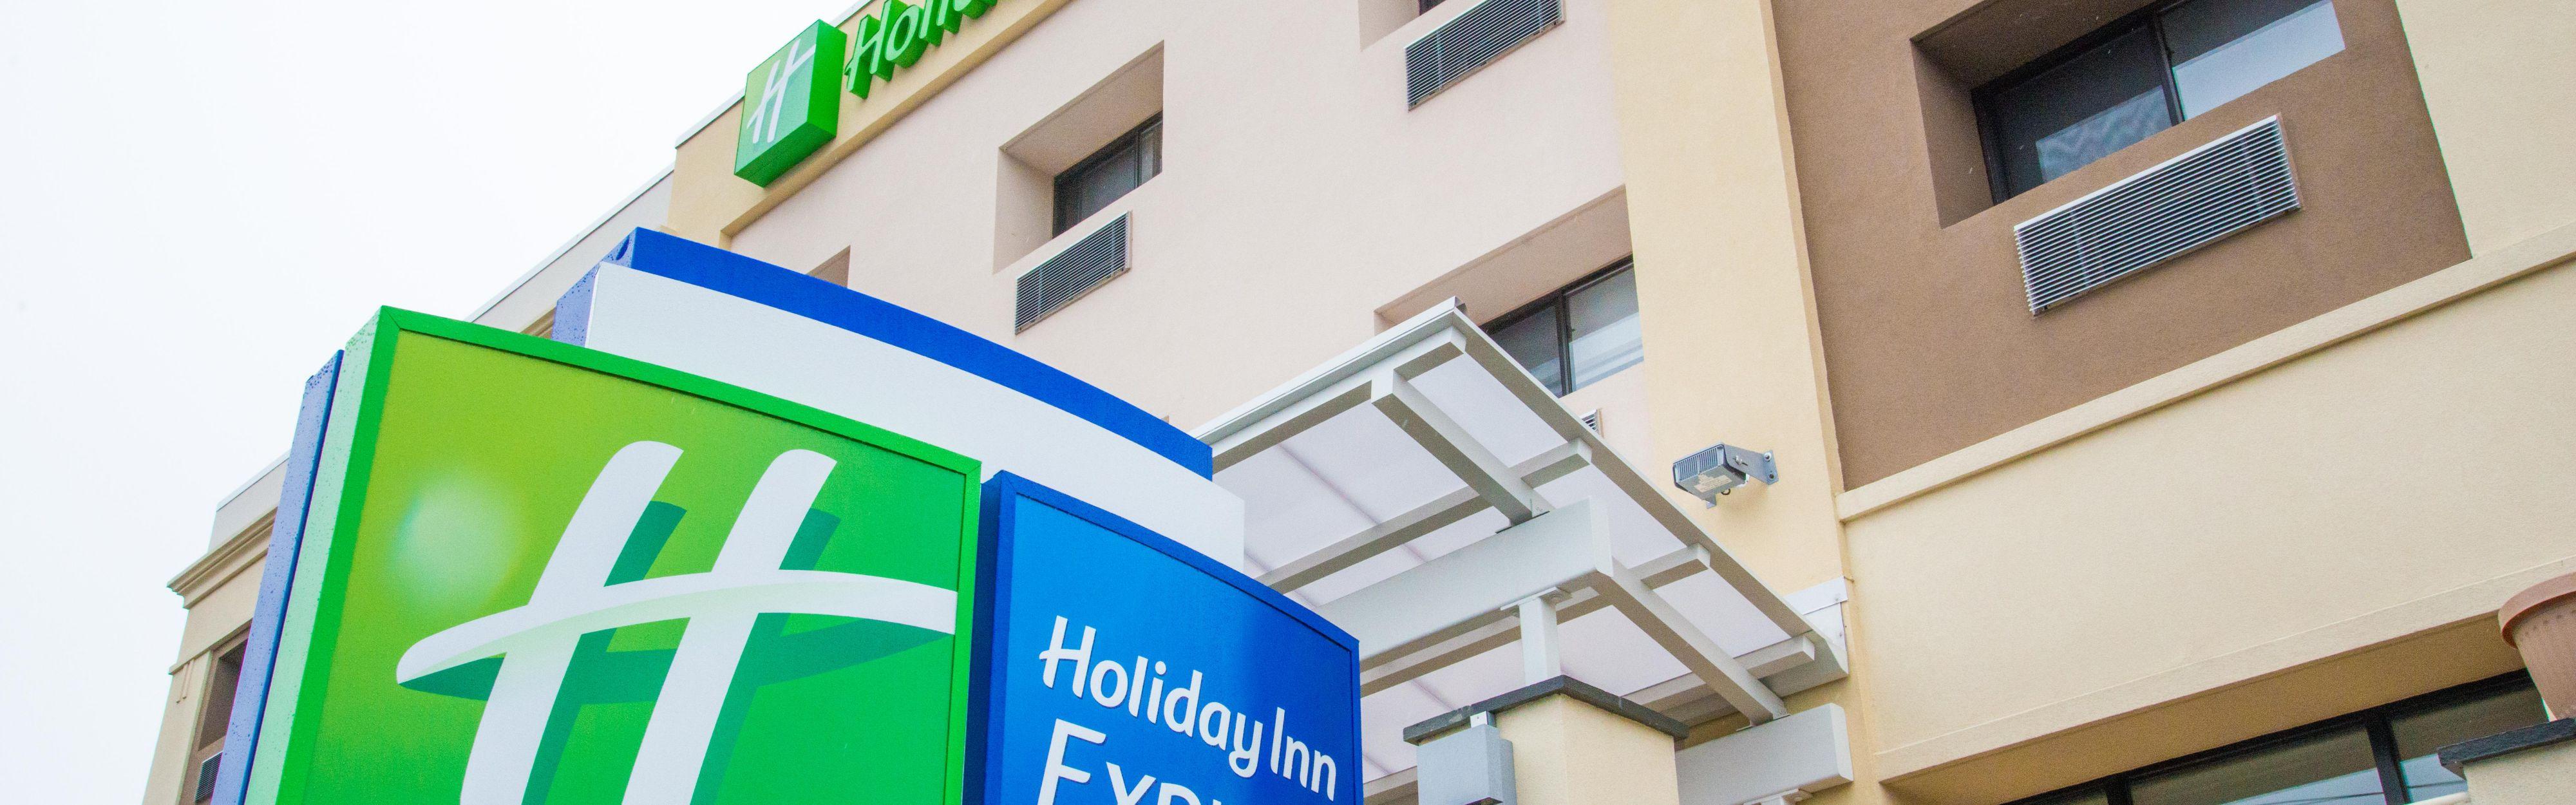 Holiday Inn Express Roslyn - Long Island image 0